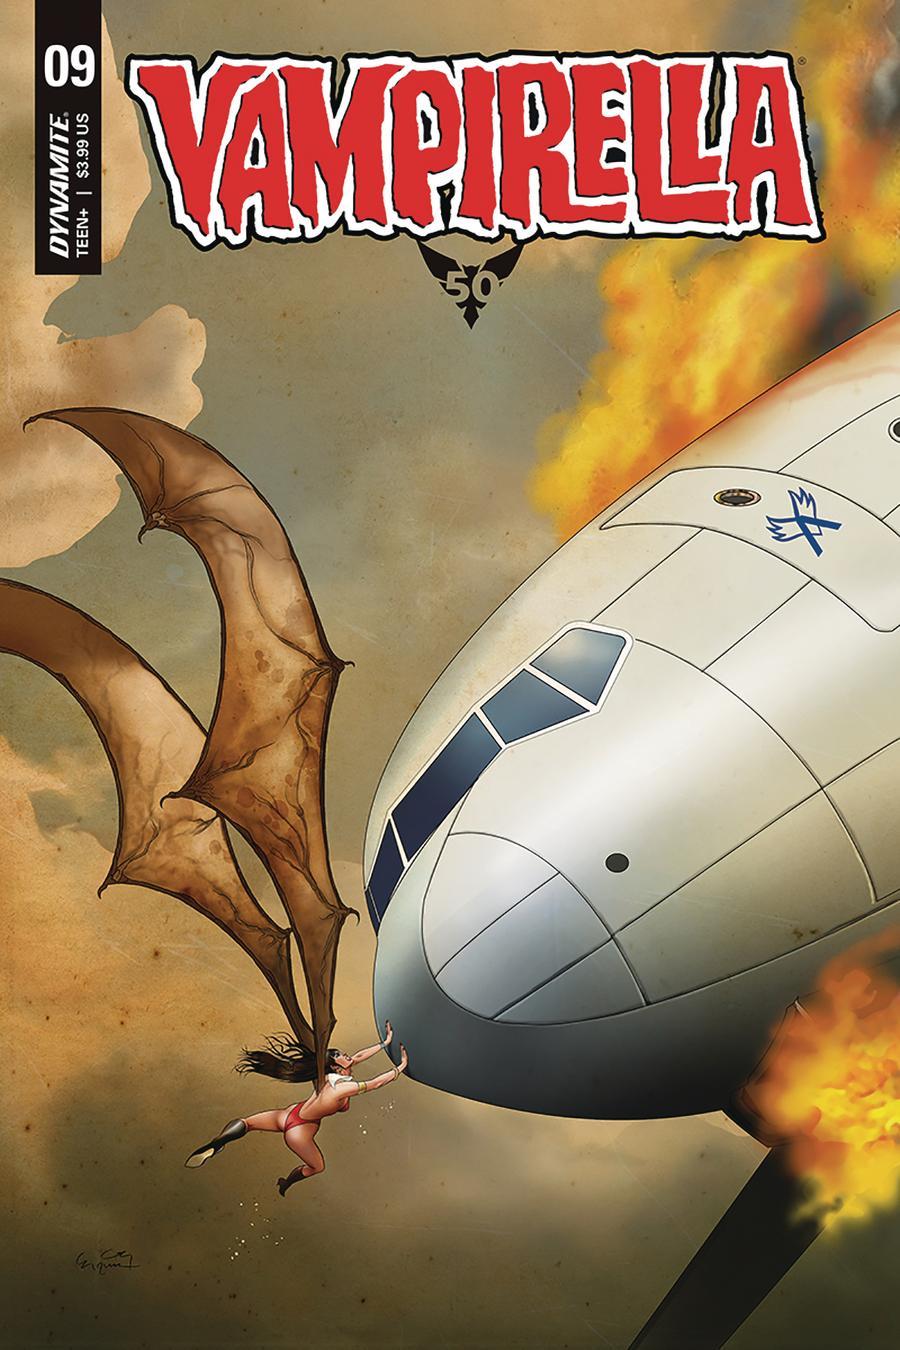 Vampirella Vol 8 #9 Cover D Variant Ergun Gunduz Cover